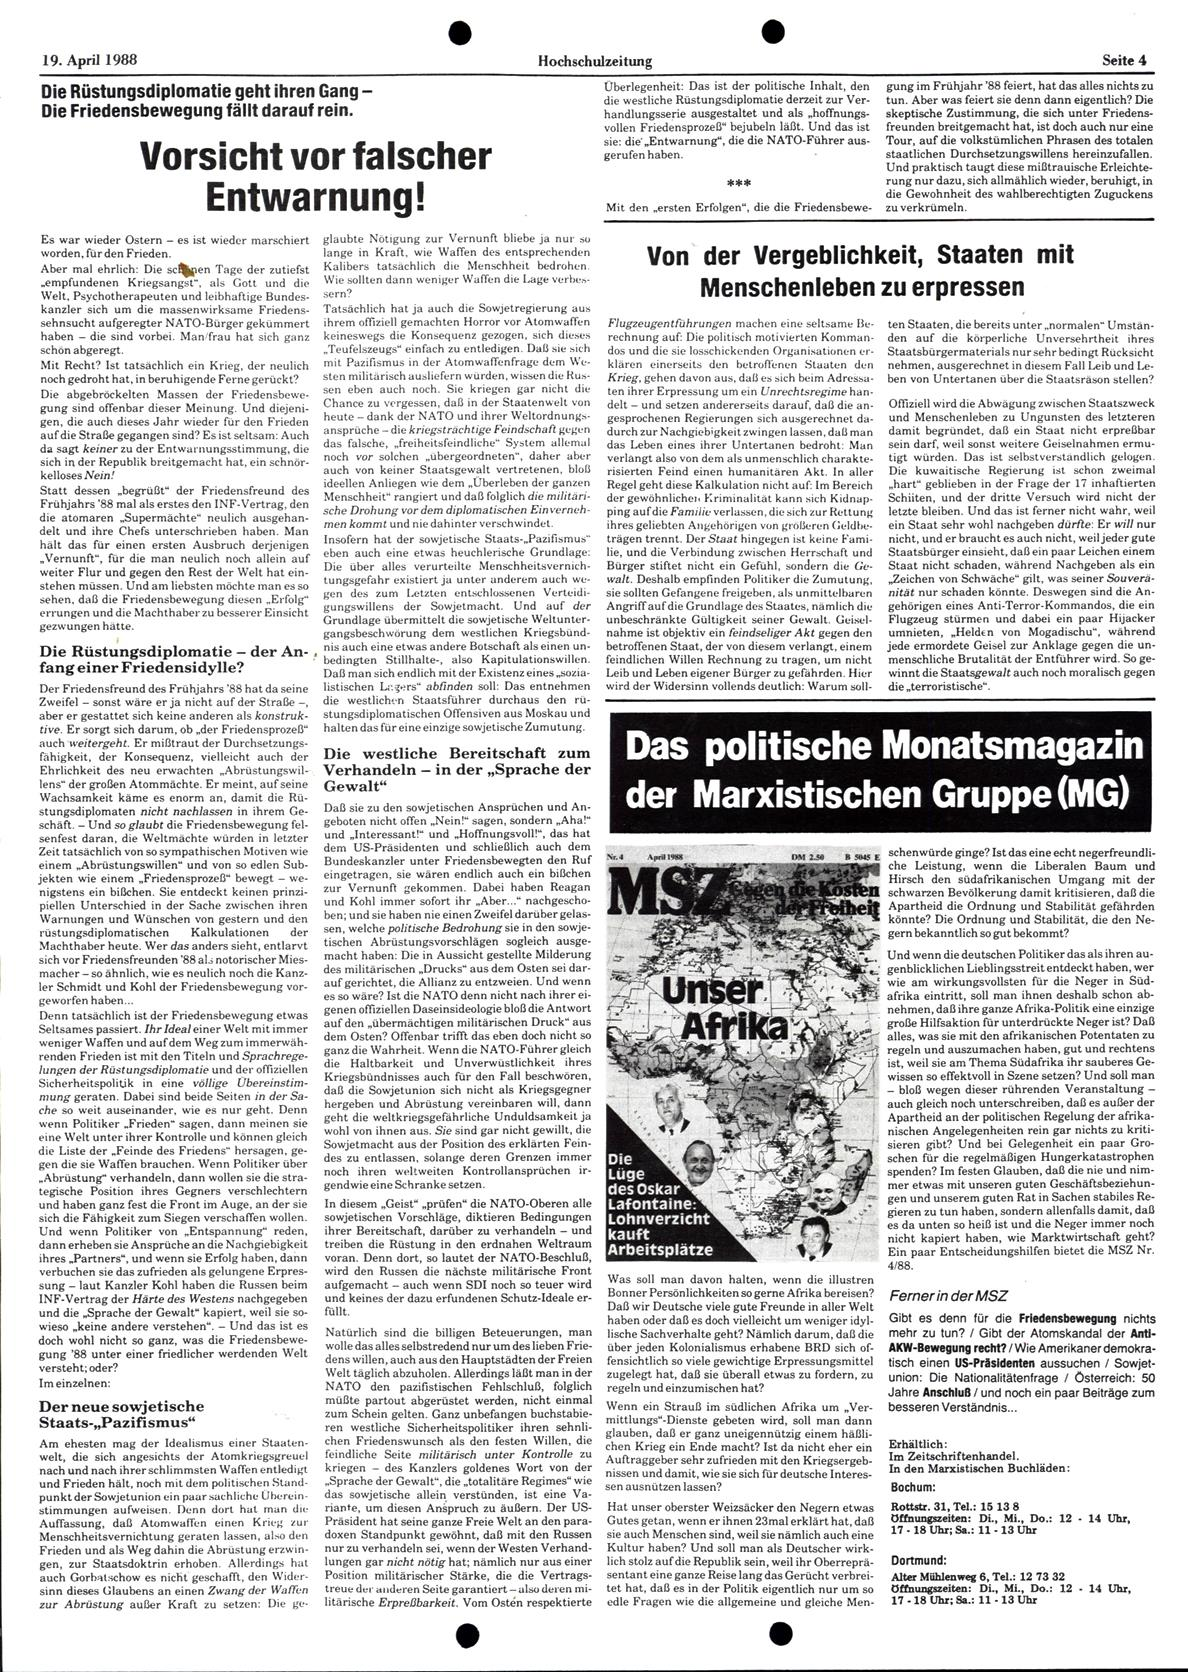 Bochum_BHZ_19880419_166_004